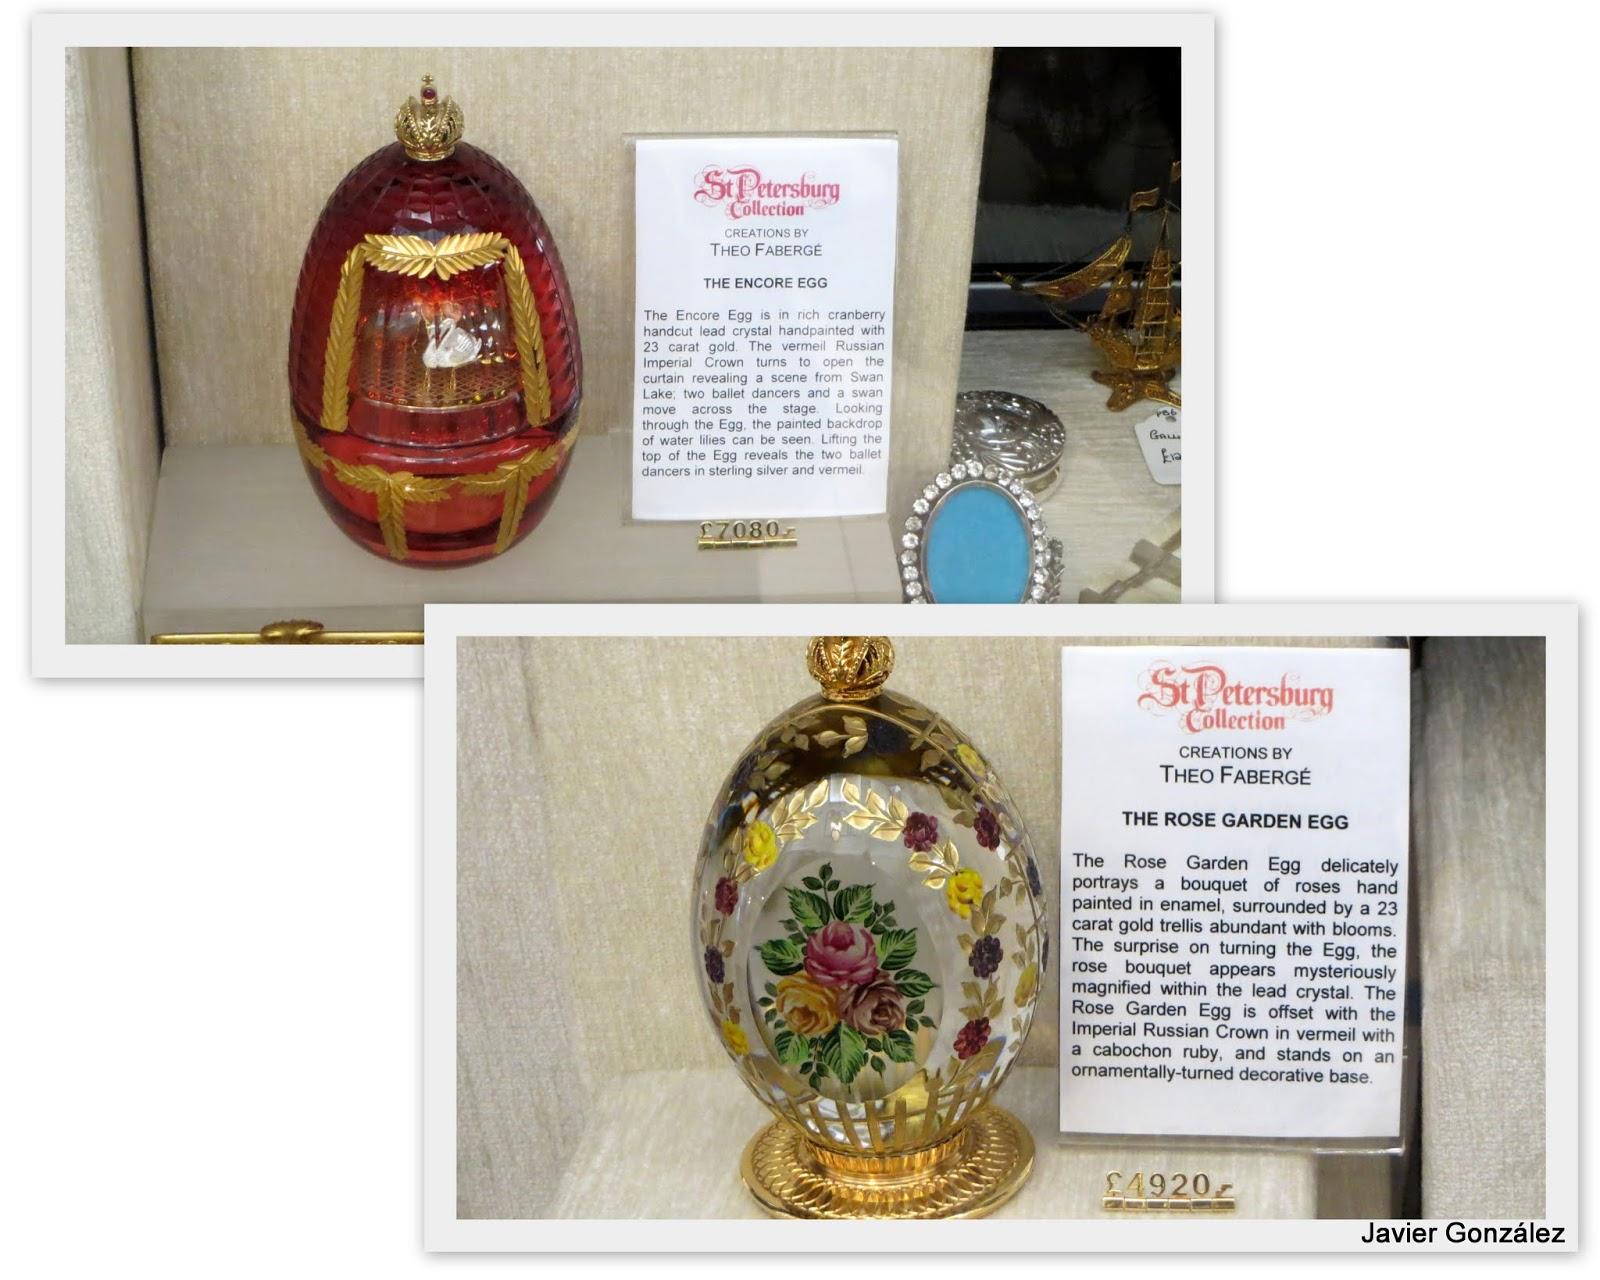 Londres. Colección San Petersburgo. Huevos Fabergé